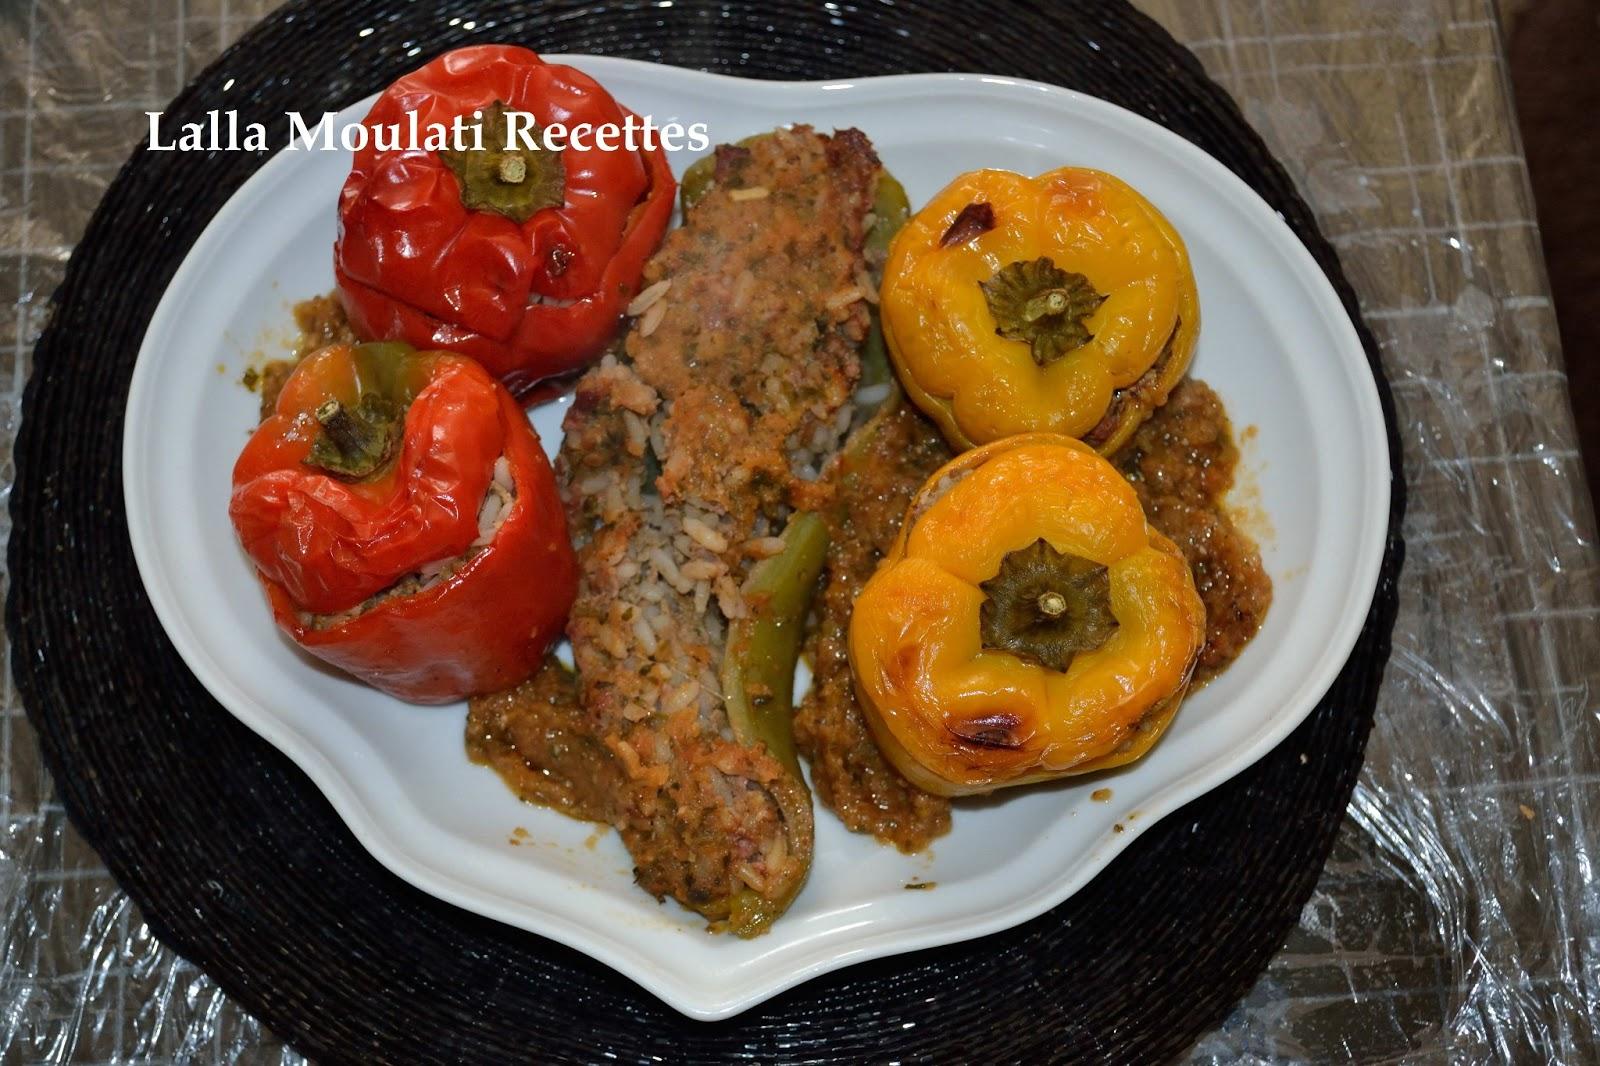 Pin lala moulati cuisine portal on pinterest for Cuisine marocaine